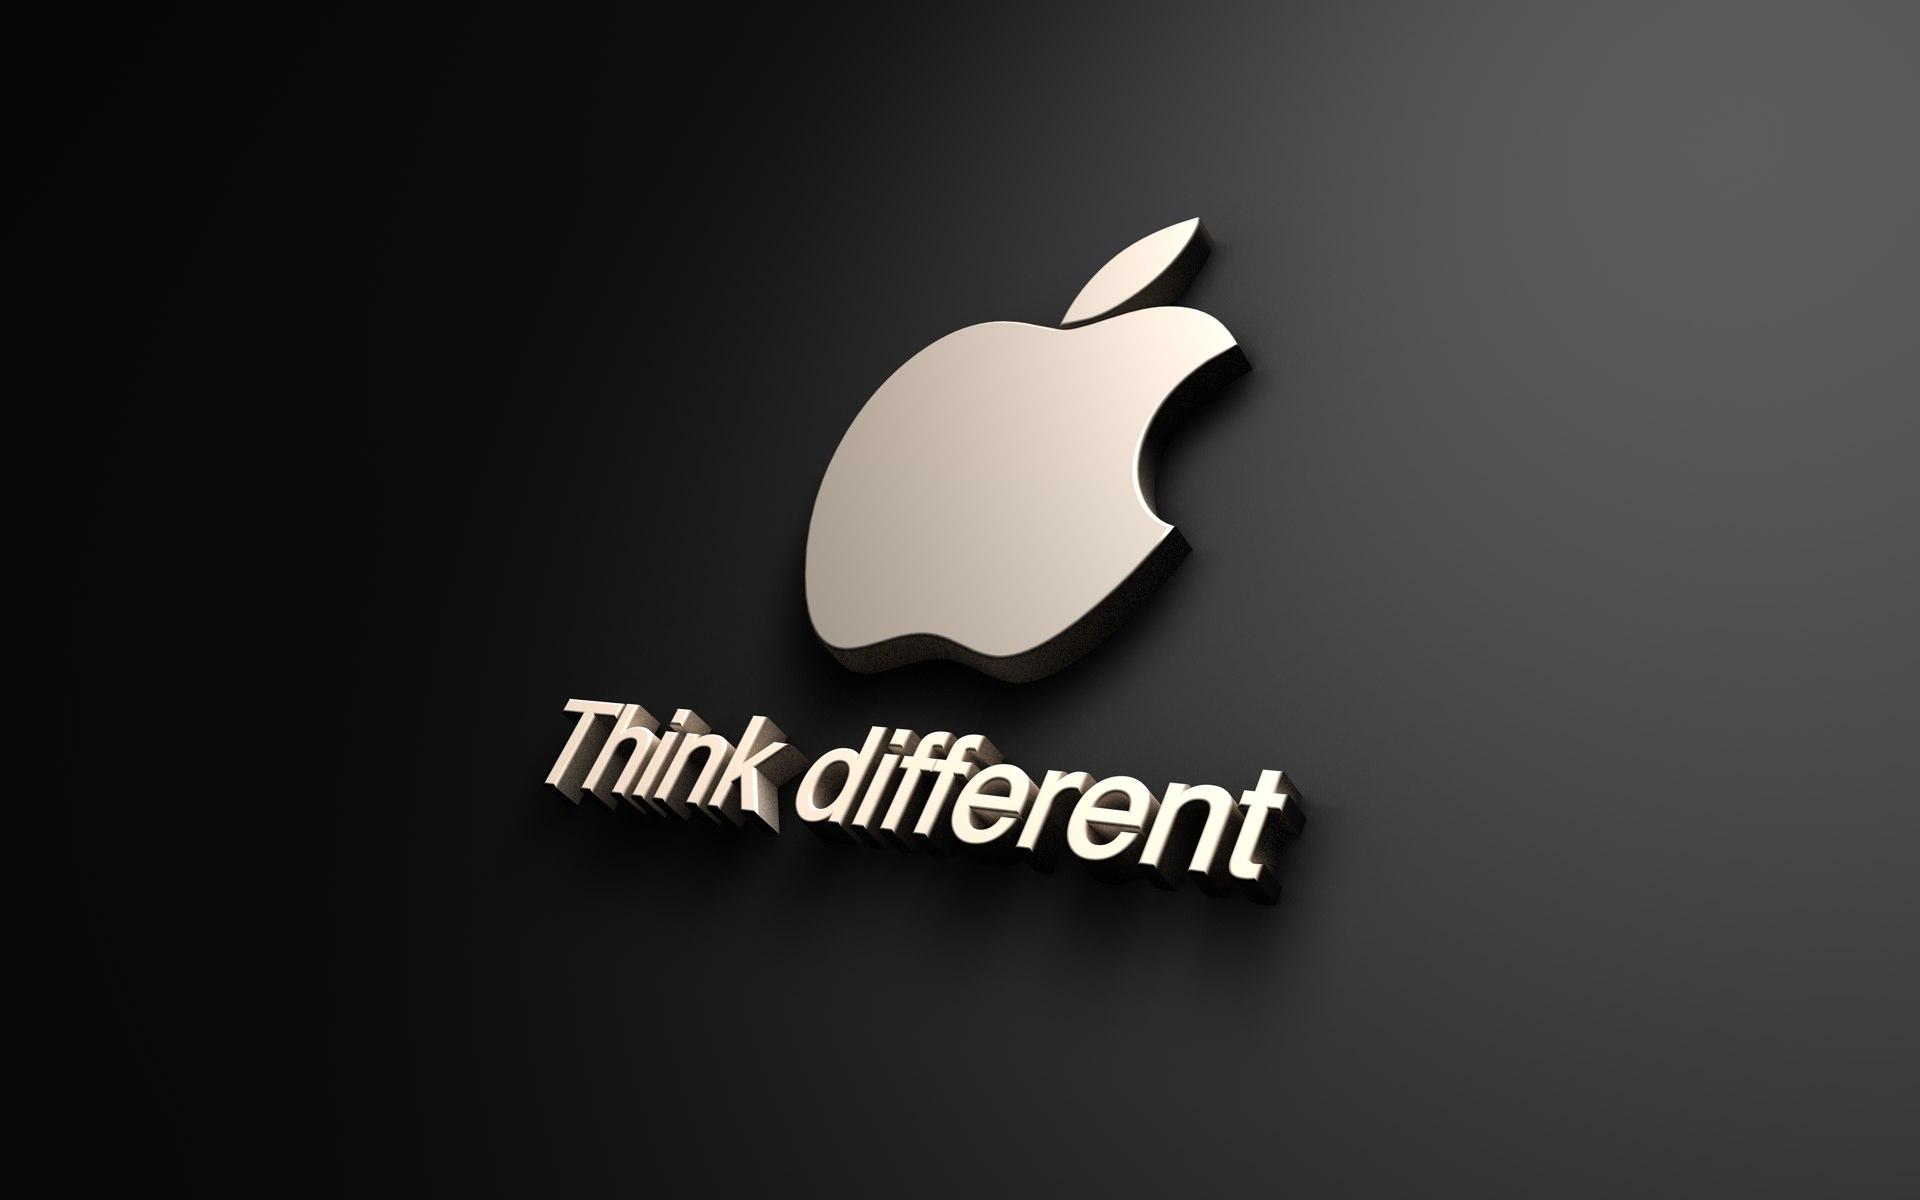 Apple Logo Wallpapers-7